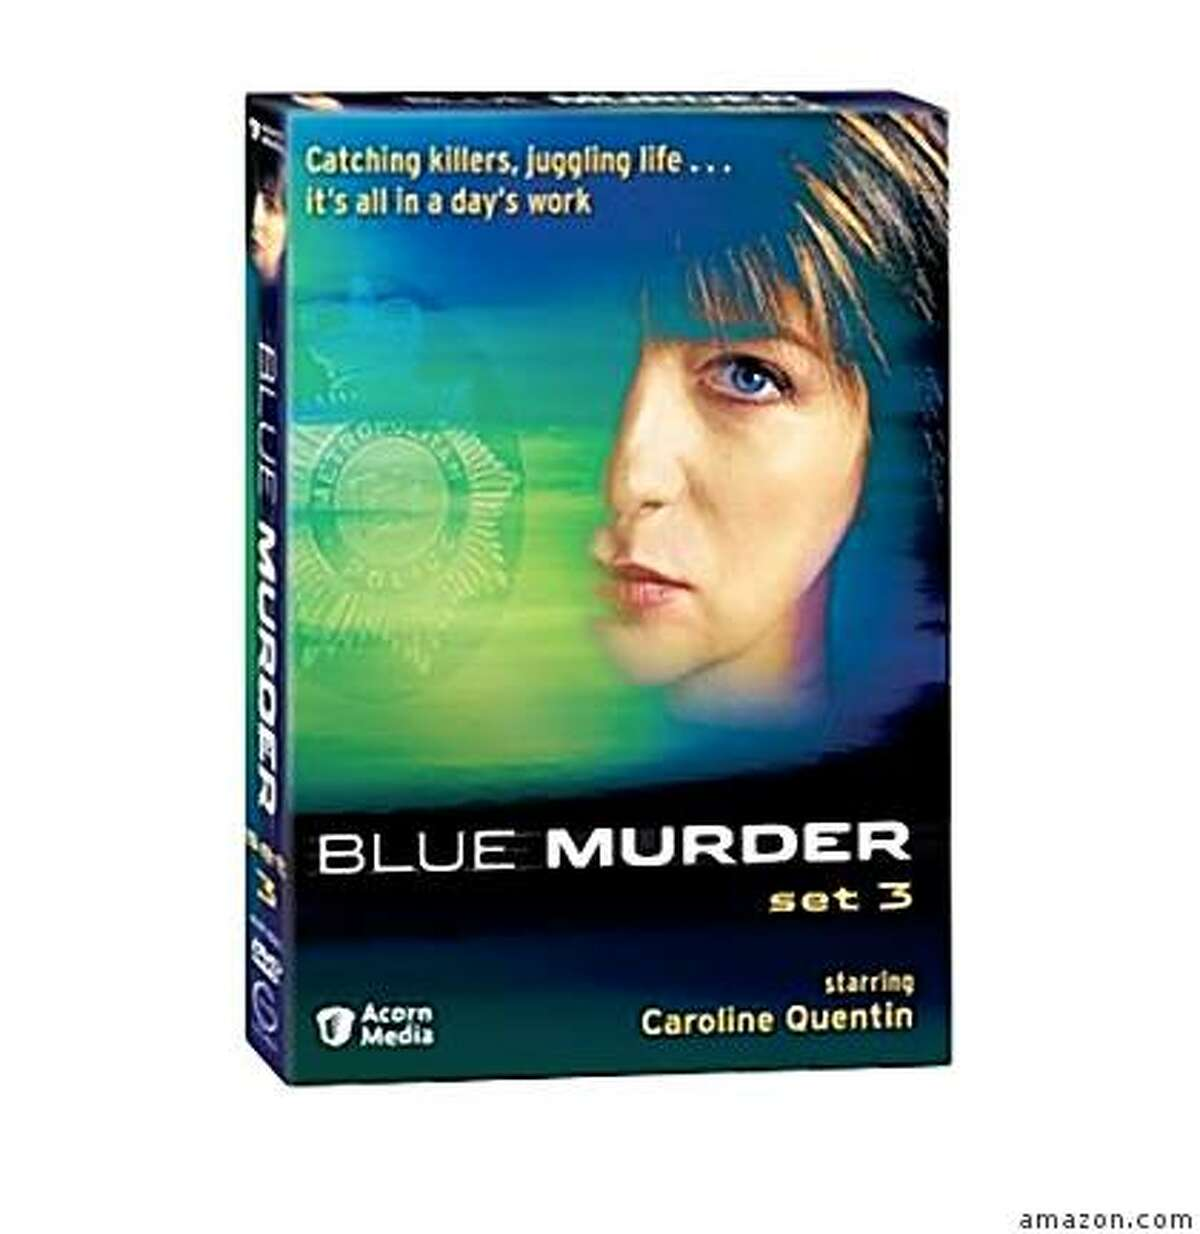 dvd cover: BLUE MURDER: SET 3